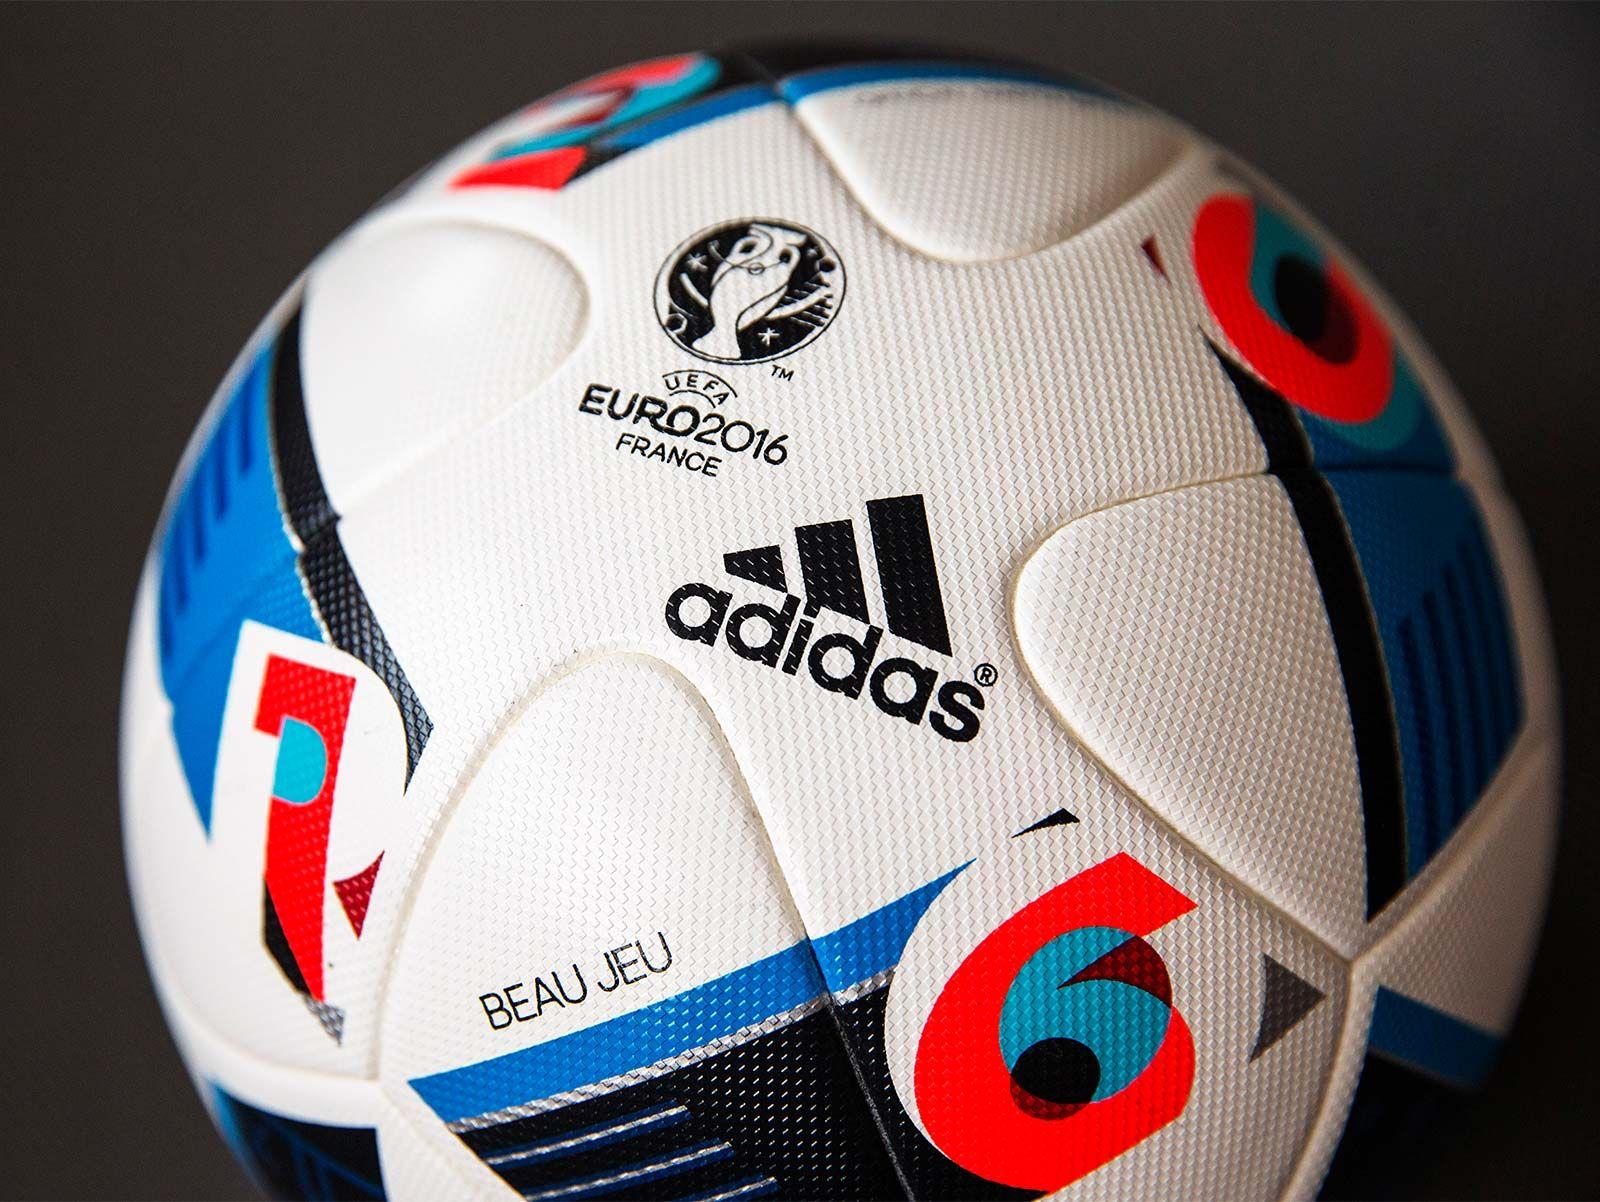 Pin By Xenonjbc Superme On Matt Beedle Euro Shoot Adidas Sneakers Women Adidas Superstar Jacket Rose Gold Adidas